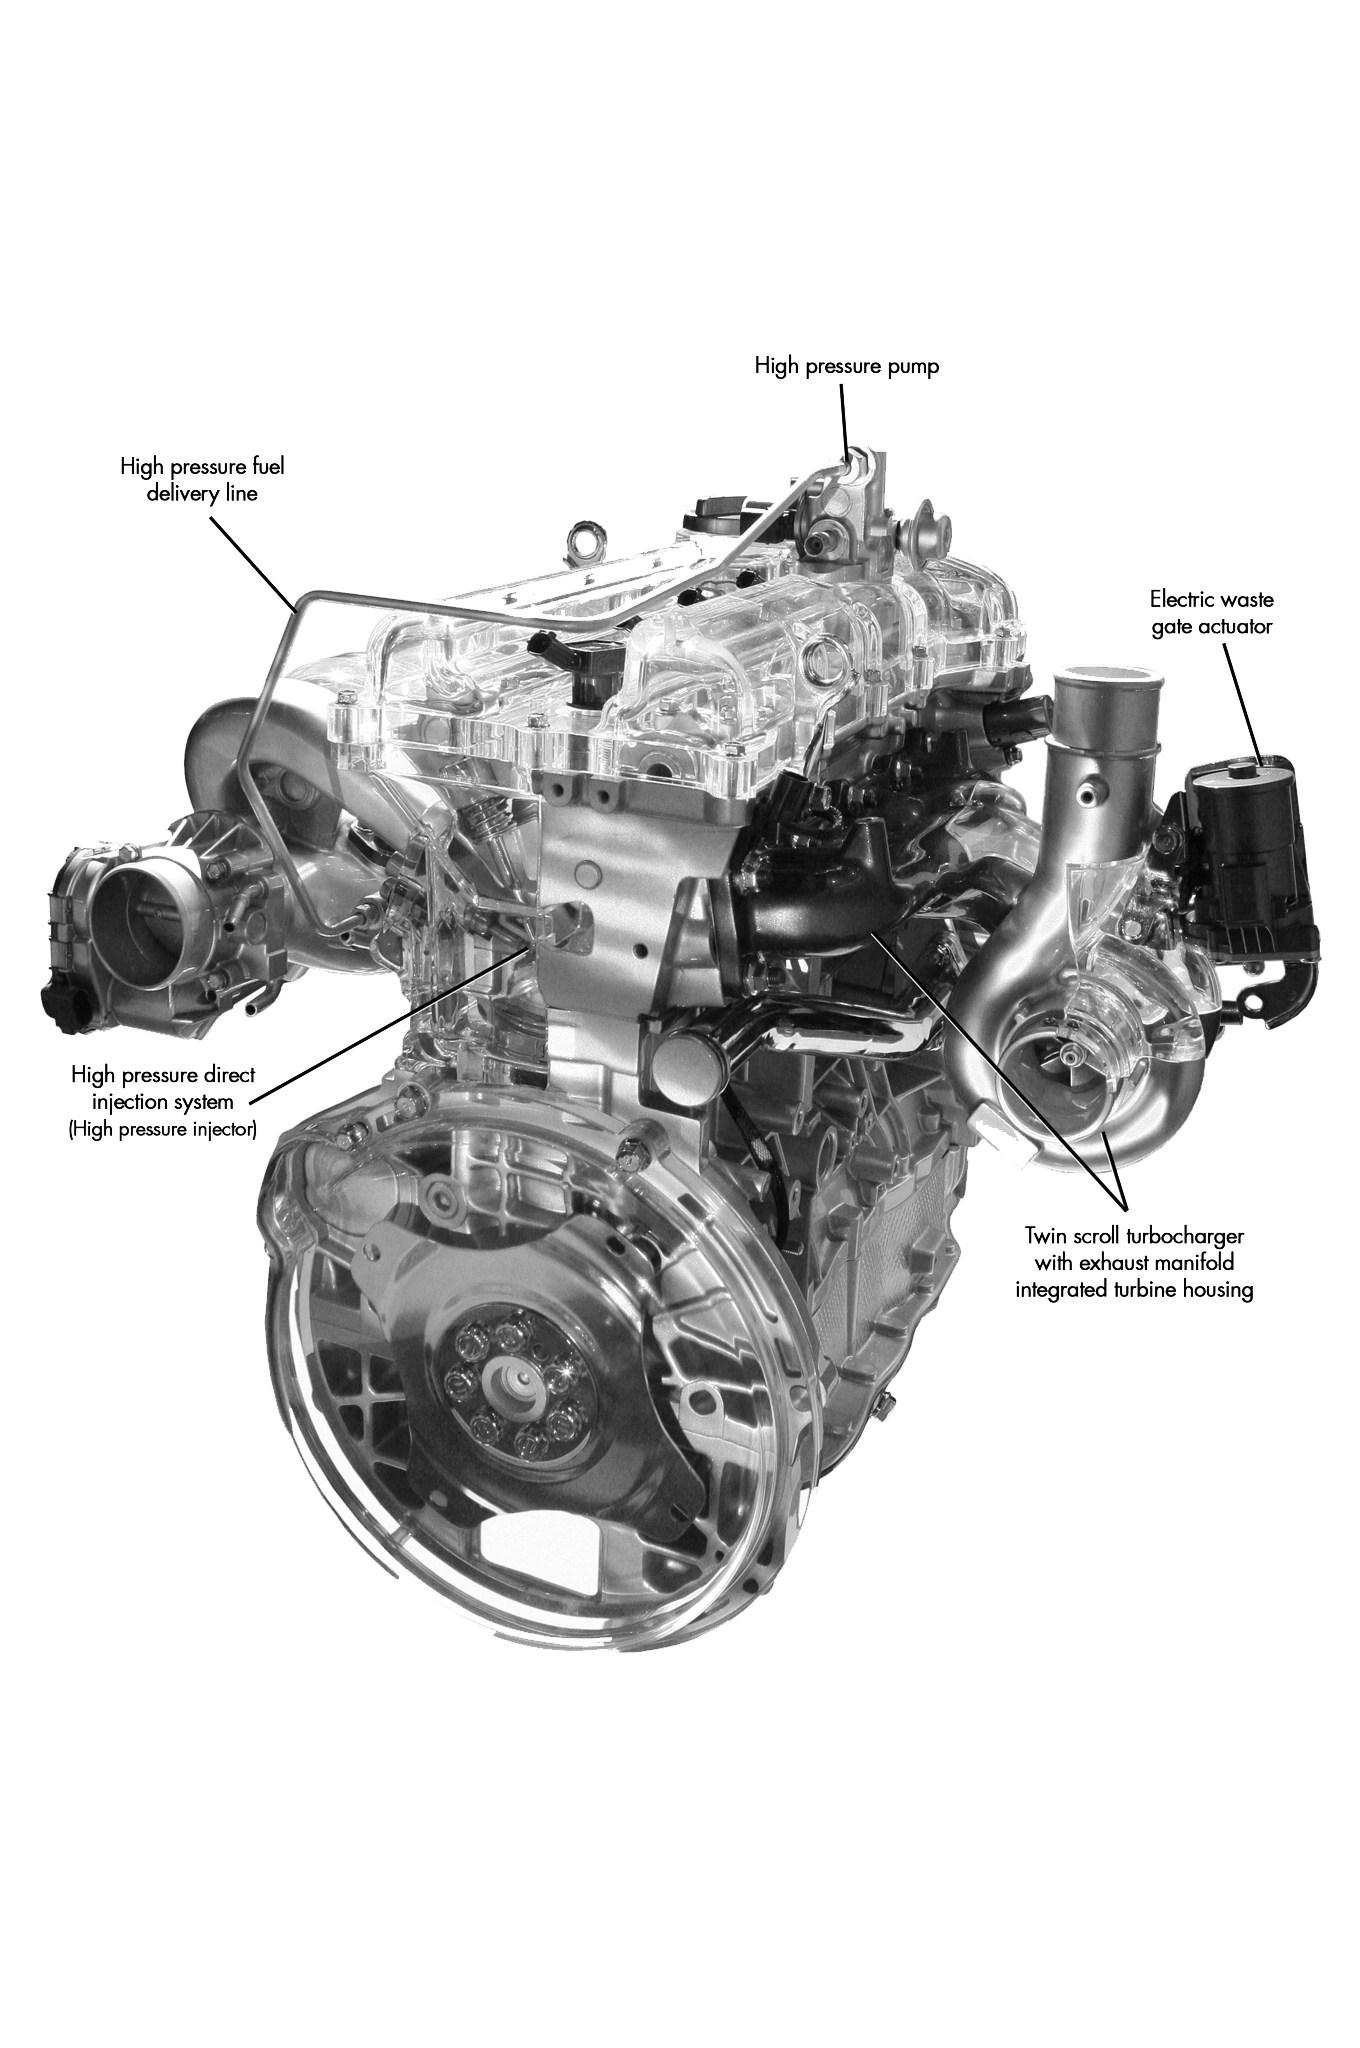 hight resolution of hyundai 2 4 engine parts diagram wiring library 2013 hyundai sonata 20t engine 7 hyundai 2